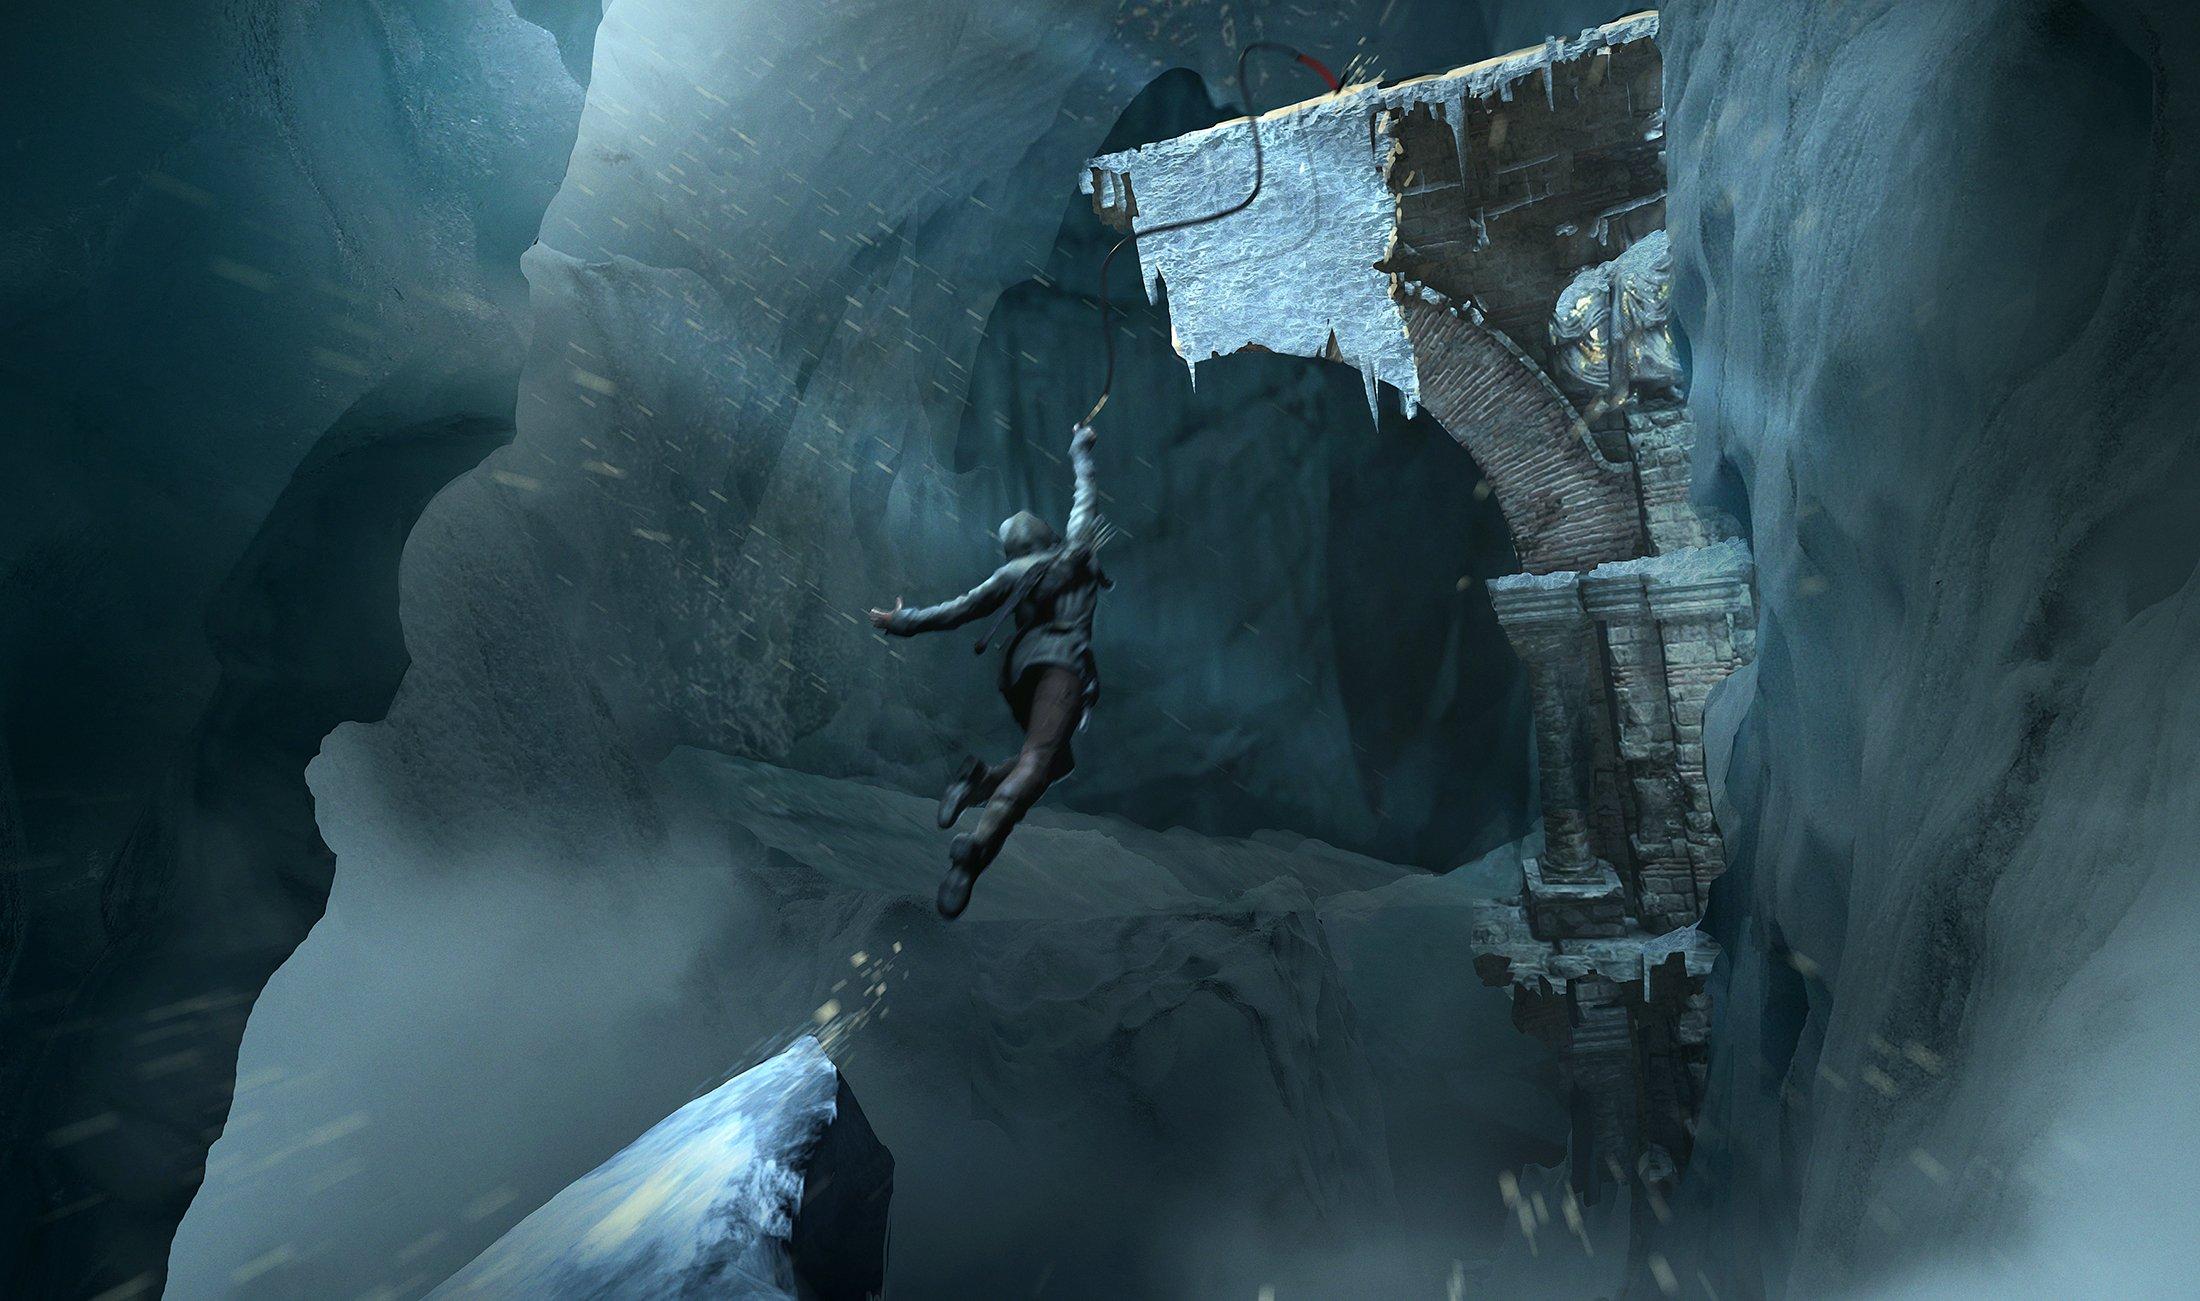 Rise of the Tomb Raider Concept Art - Изображение 3